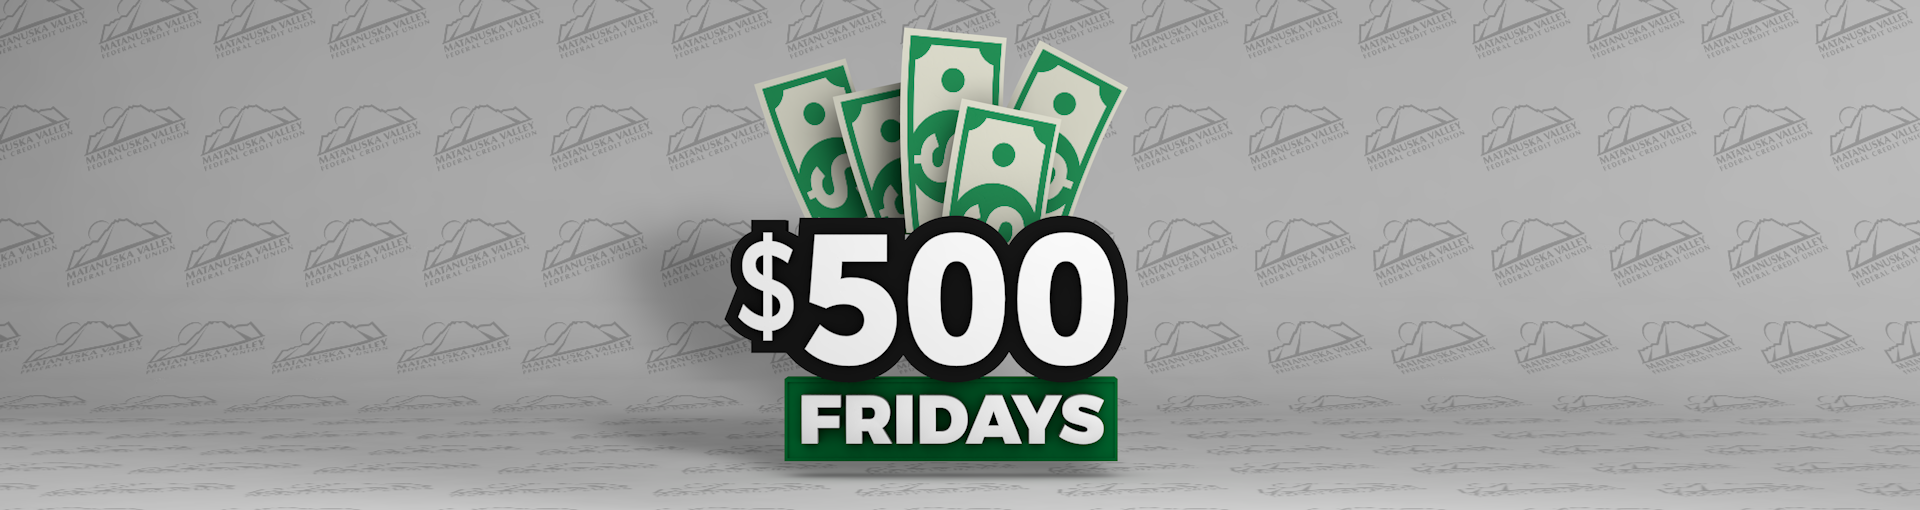 500 dollar fridays banner